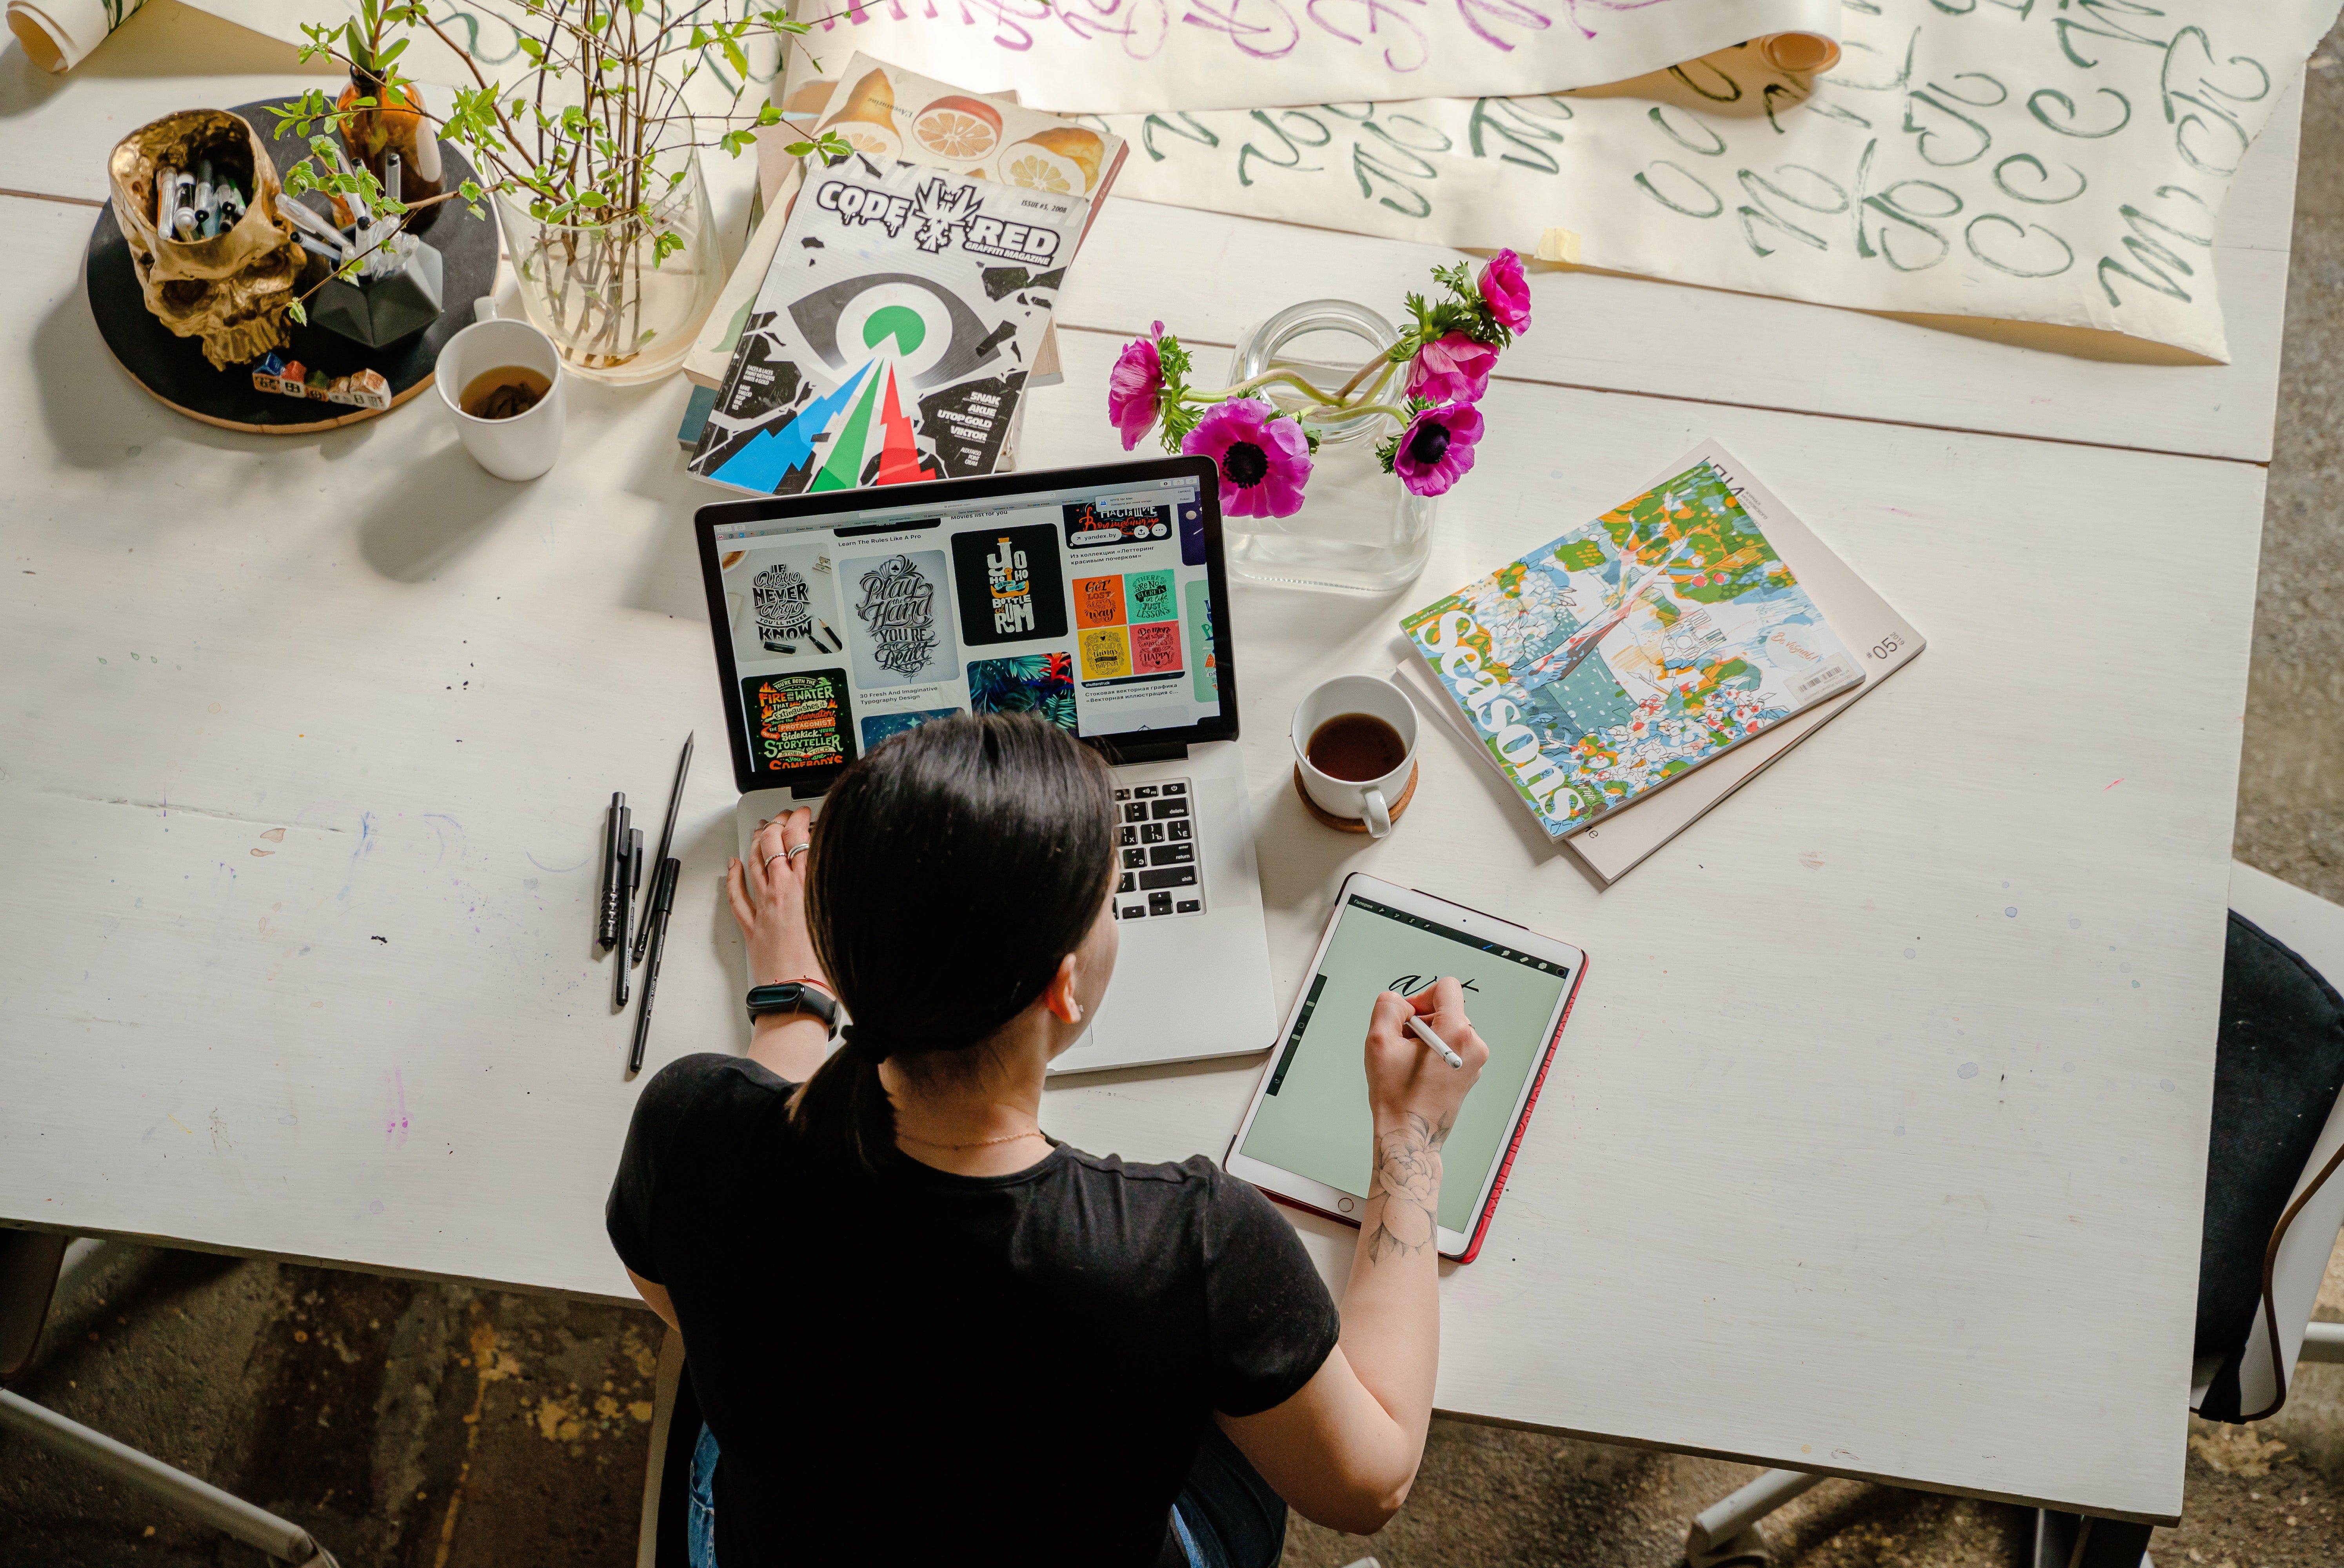 Is Technology Making Design Obsolete?